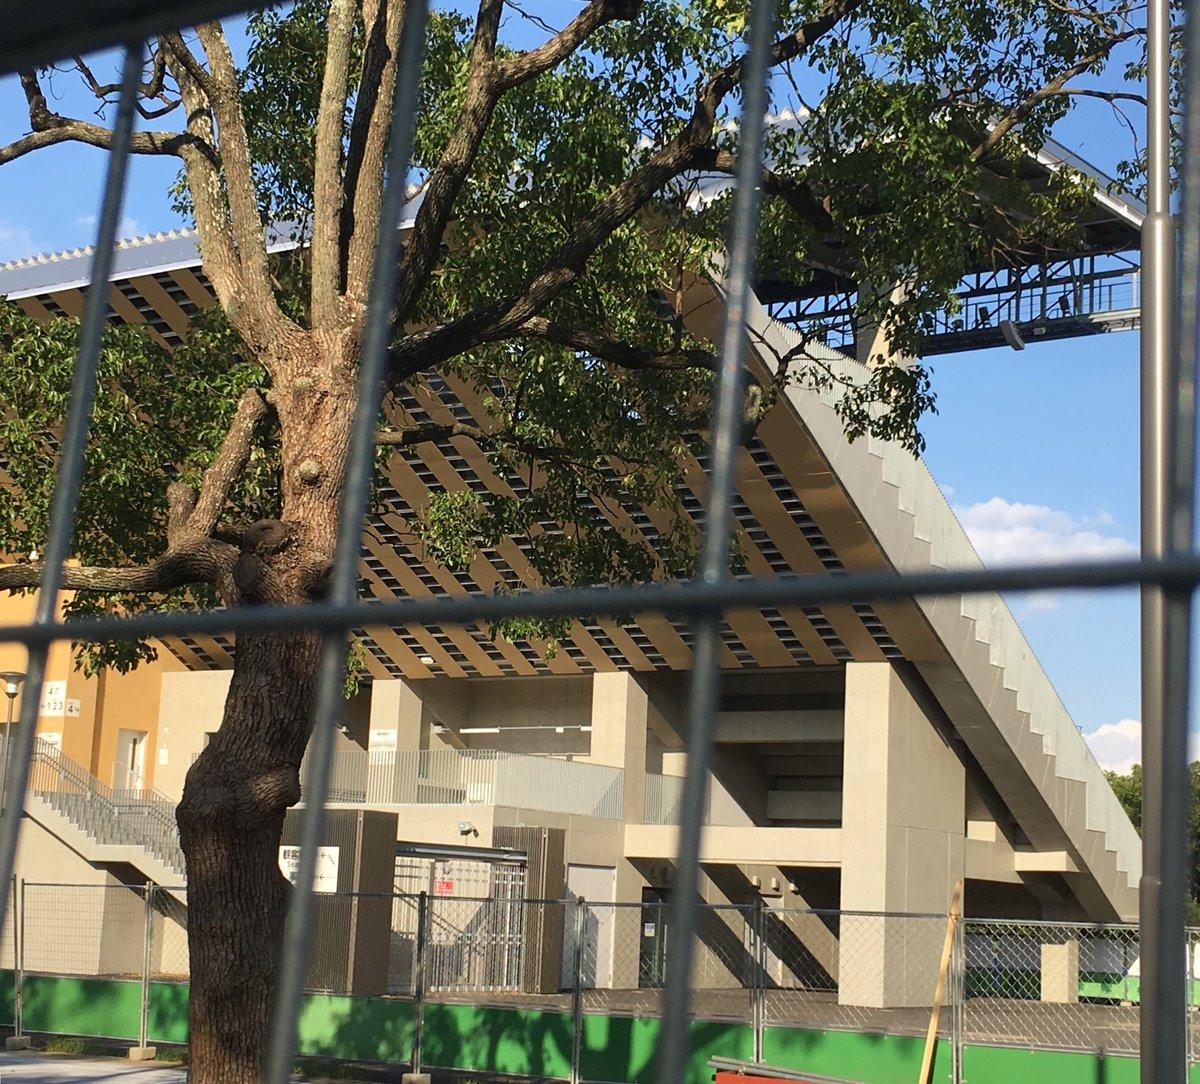 test ツイッターメディア - 完成間近のホッケー会場も木を多用。房総の台風被害もあり、来週は木に関する銘柄に注目してみます。 https://t.co/L5kWrZd3qR